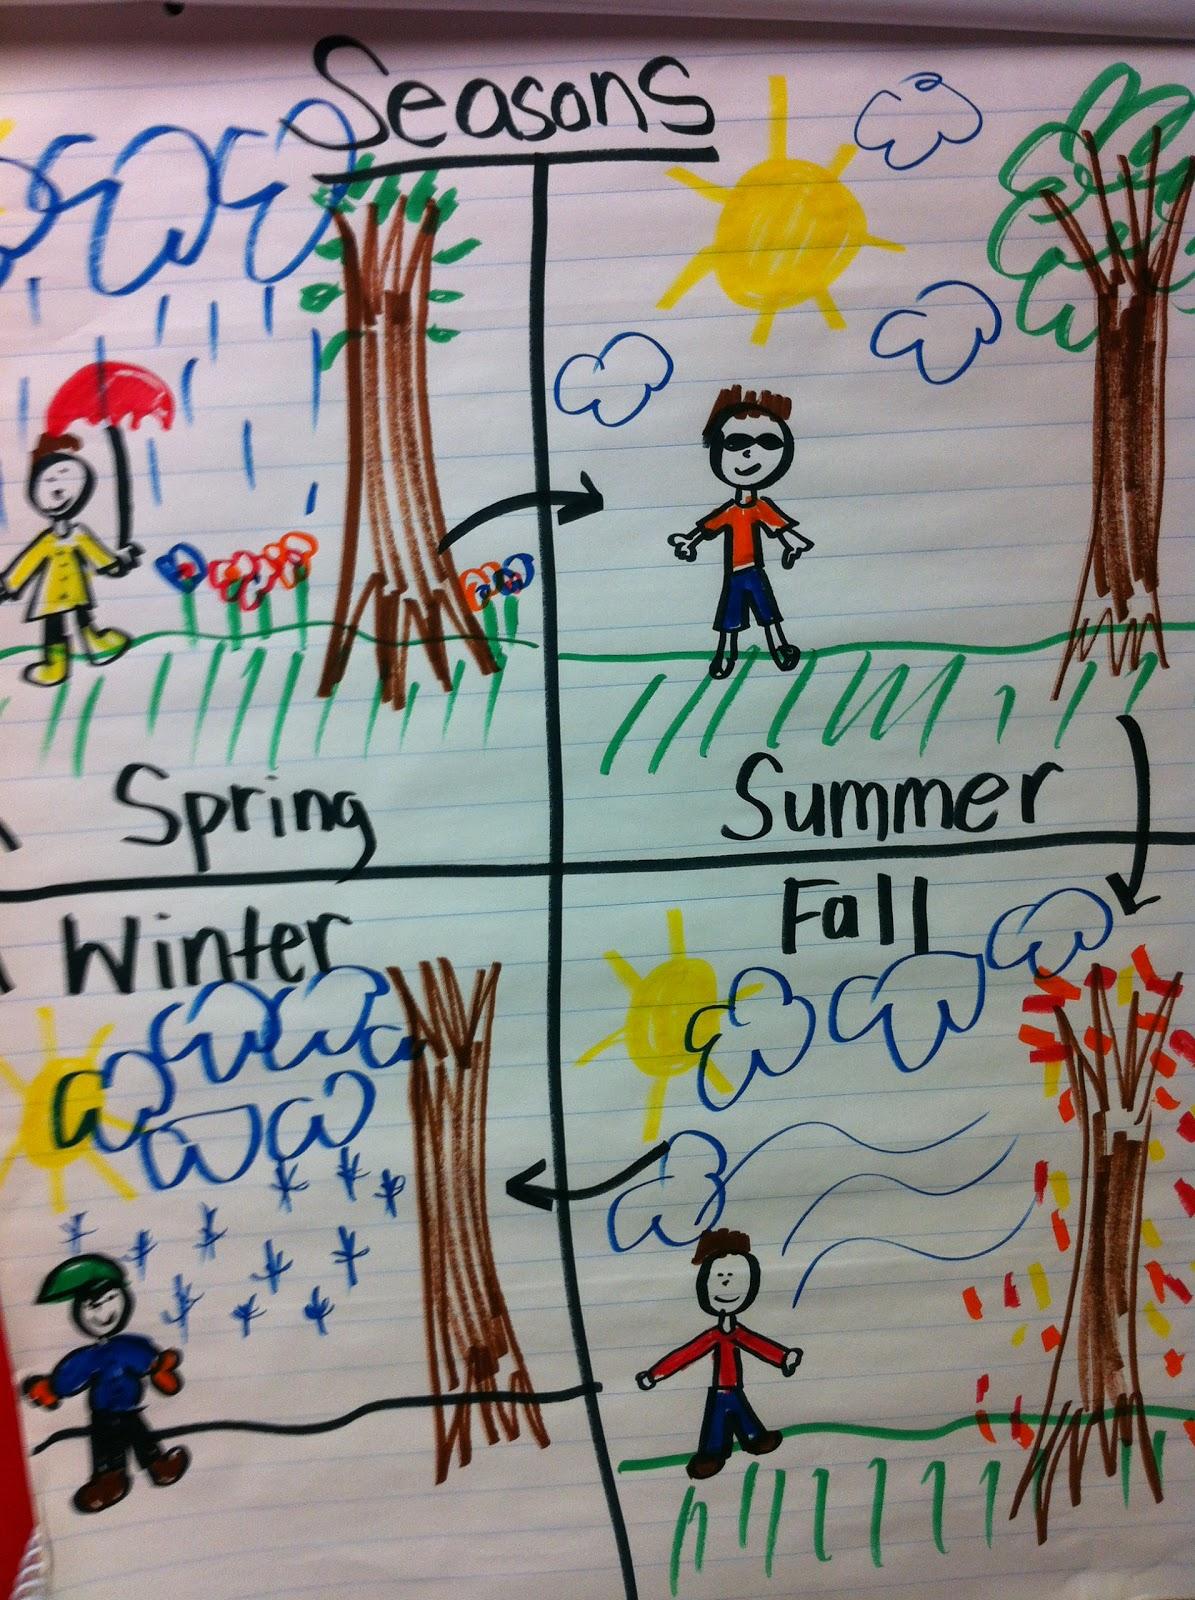 4 Seasons Drawing Easy Four Seasons Art Tree Heart Shape Royalty